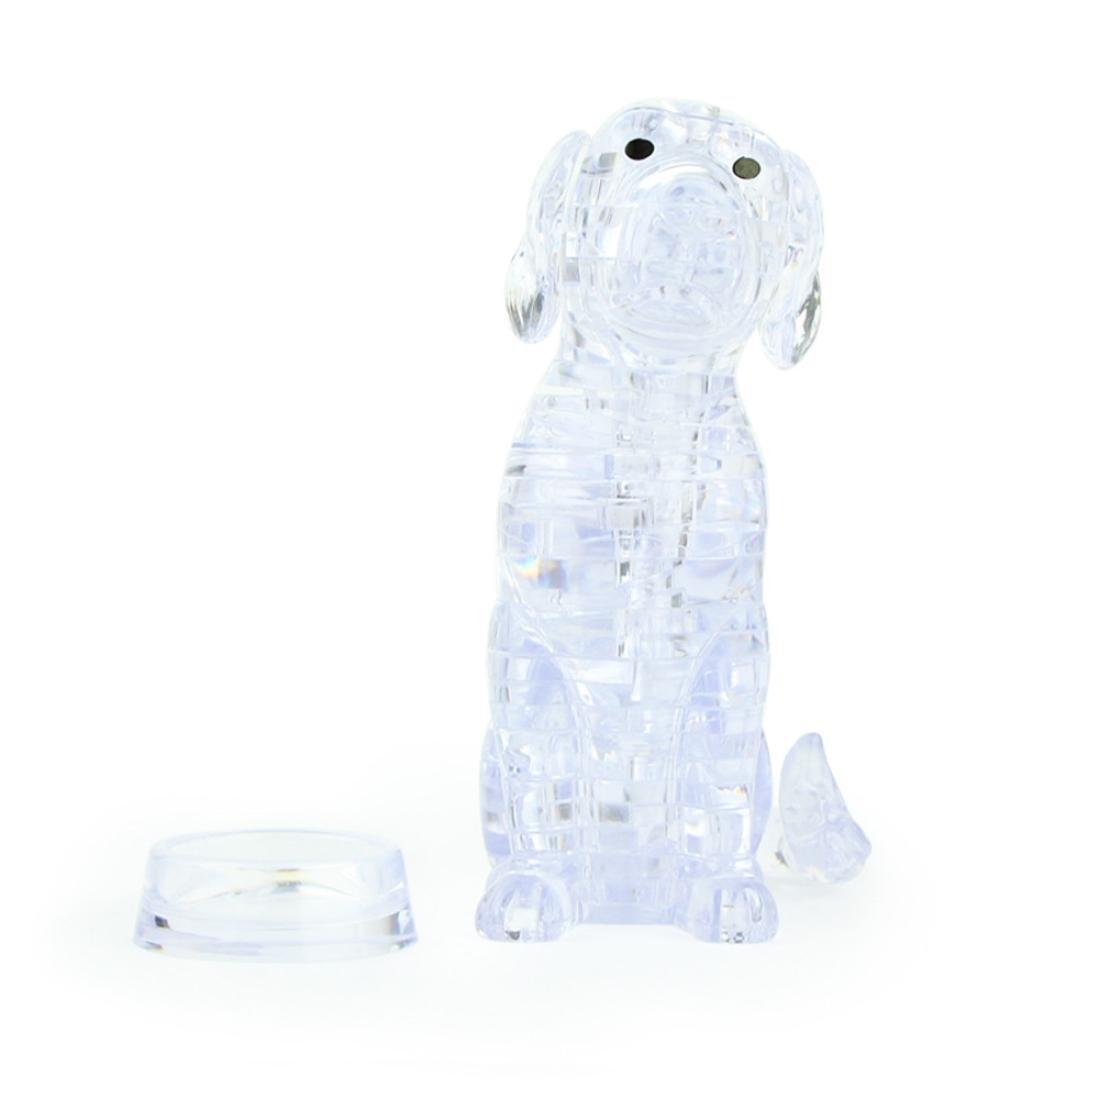 Hot Pink, Bird Original 3D Crystal Puzzle Transer Cute Bird Model 3D Jigsaw Puzzles DIY Gadget Blocks Building Toy Gift